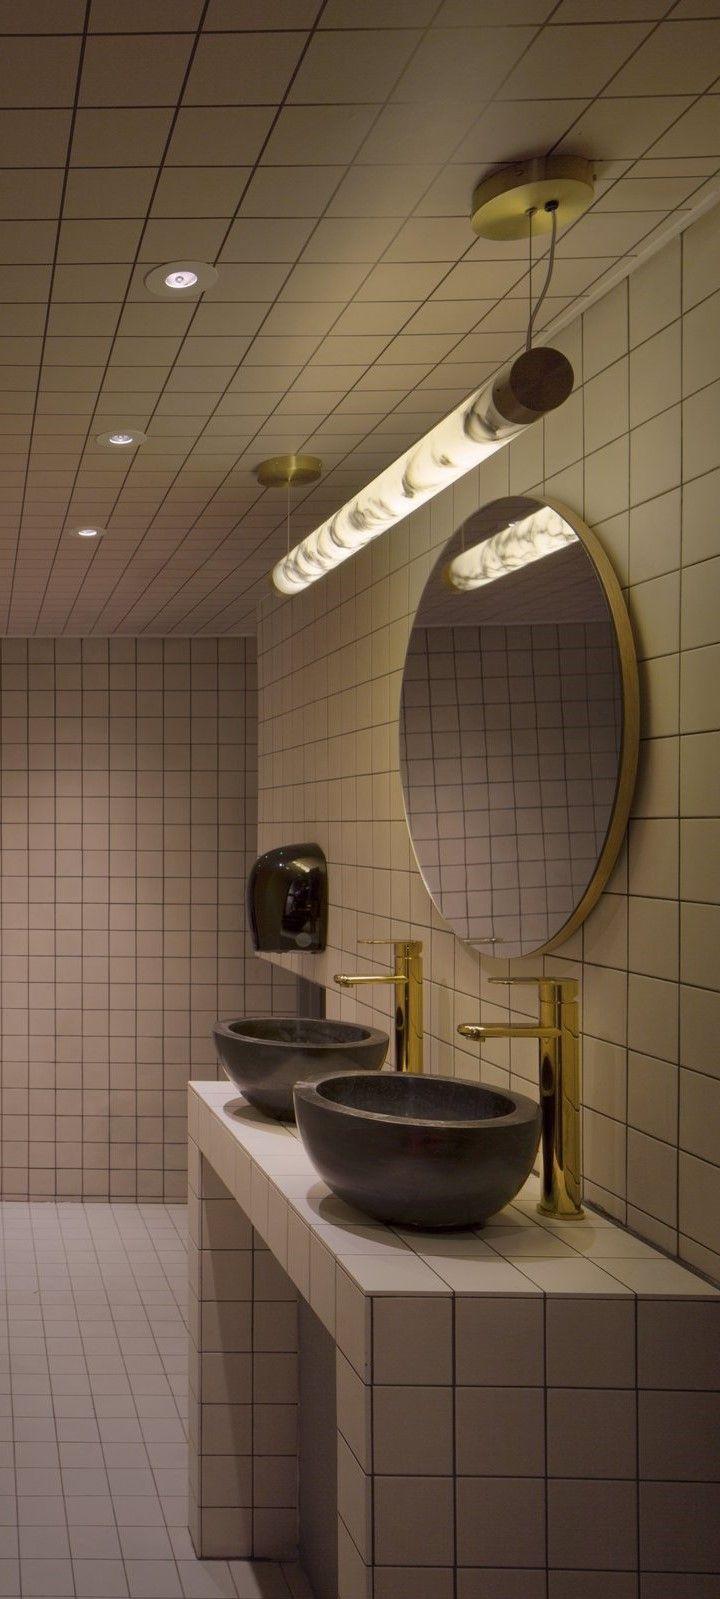 12+ Bathroom fluorescent light ideas